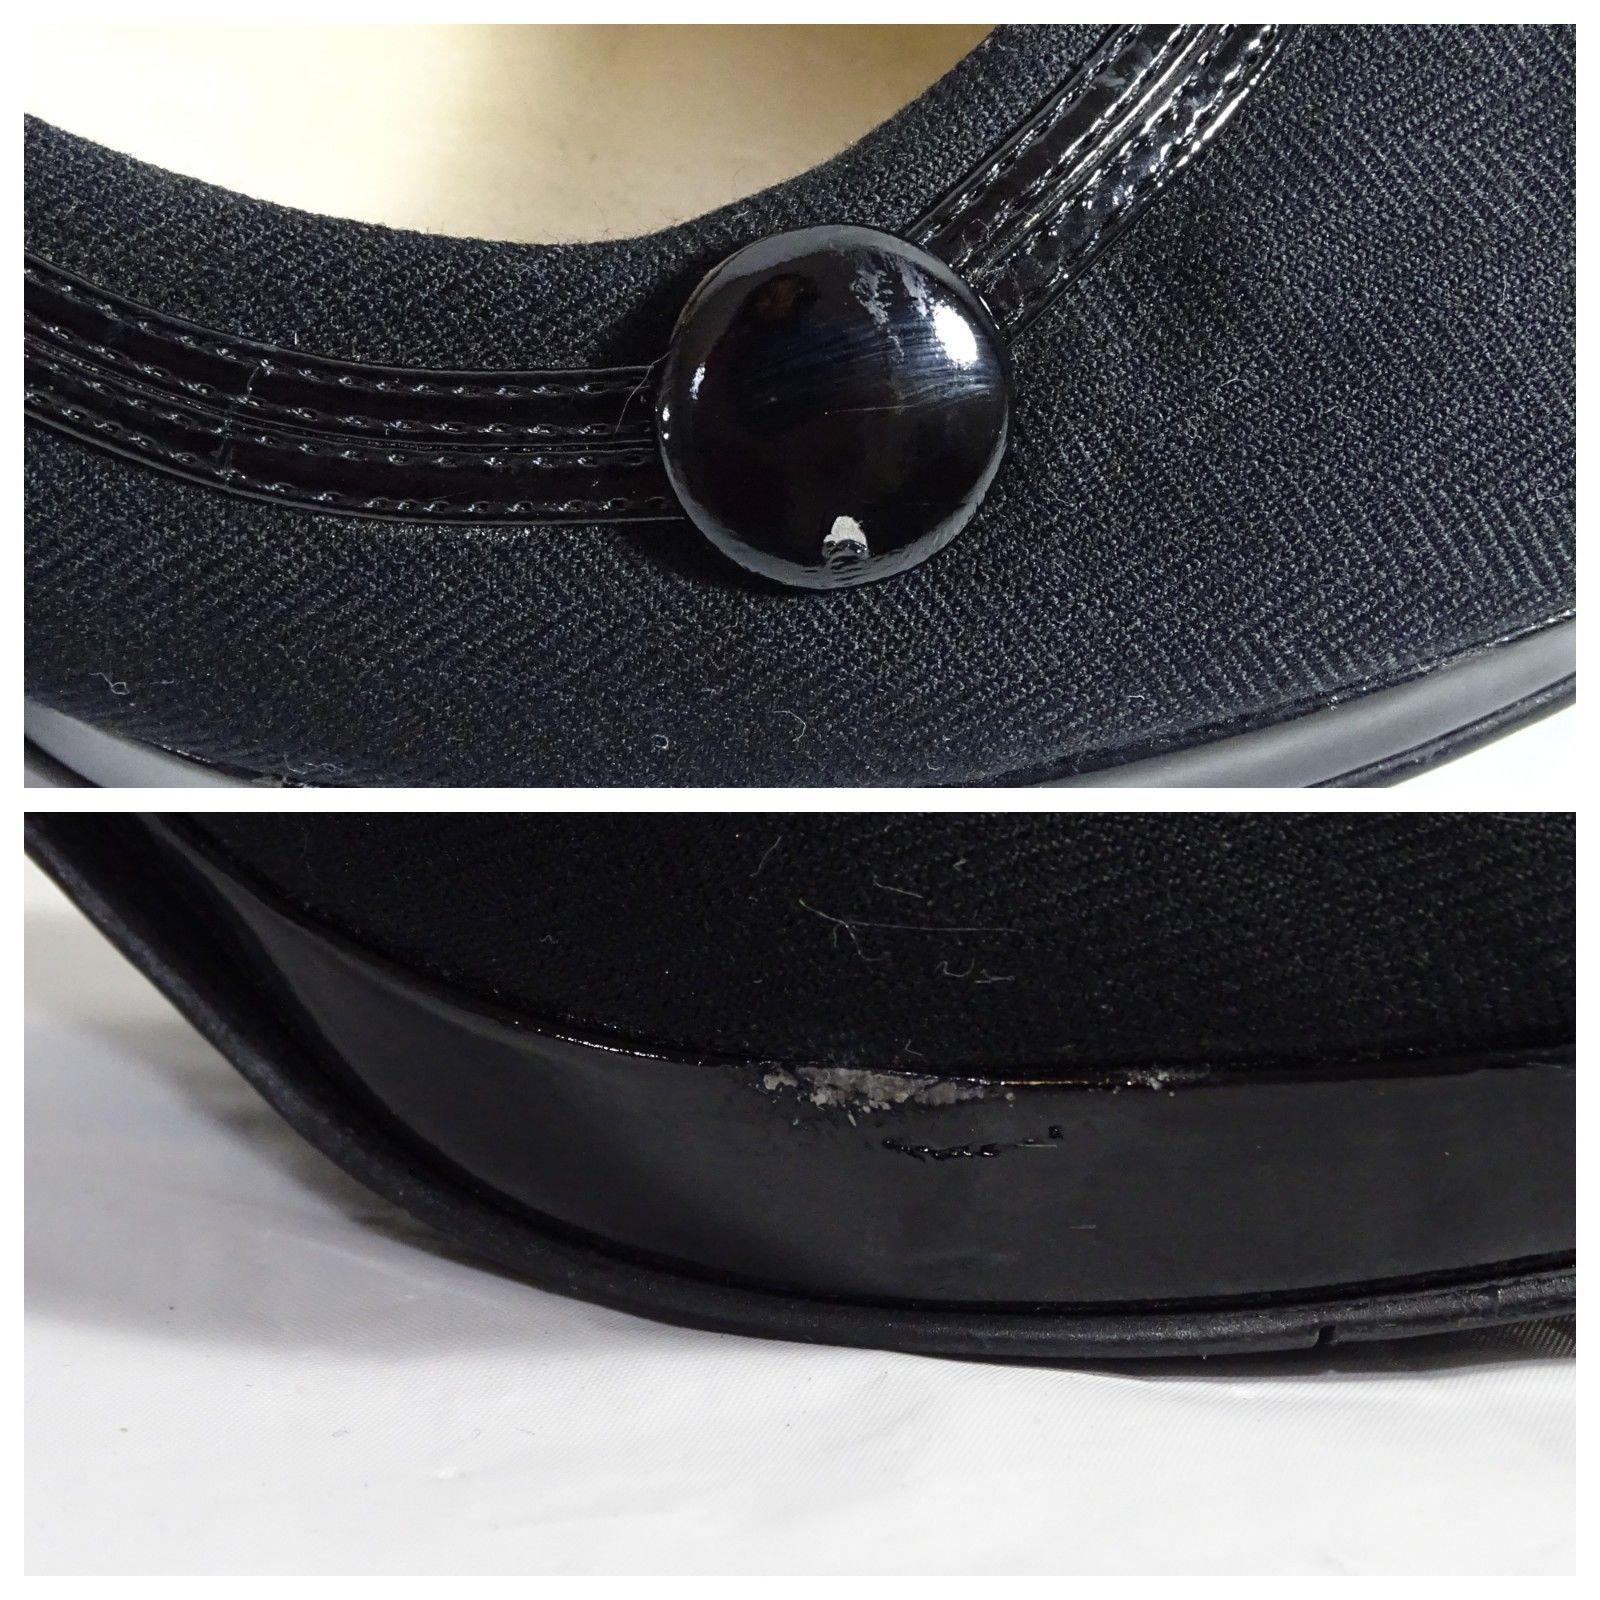 Nine West Canvas Pumps Shoes Heels Women Size 7M Black Herringbone 3.5 inch Heel